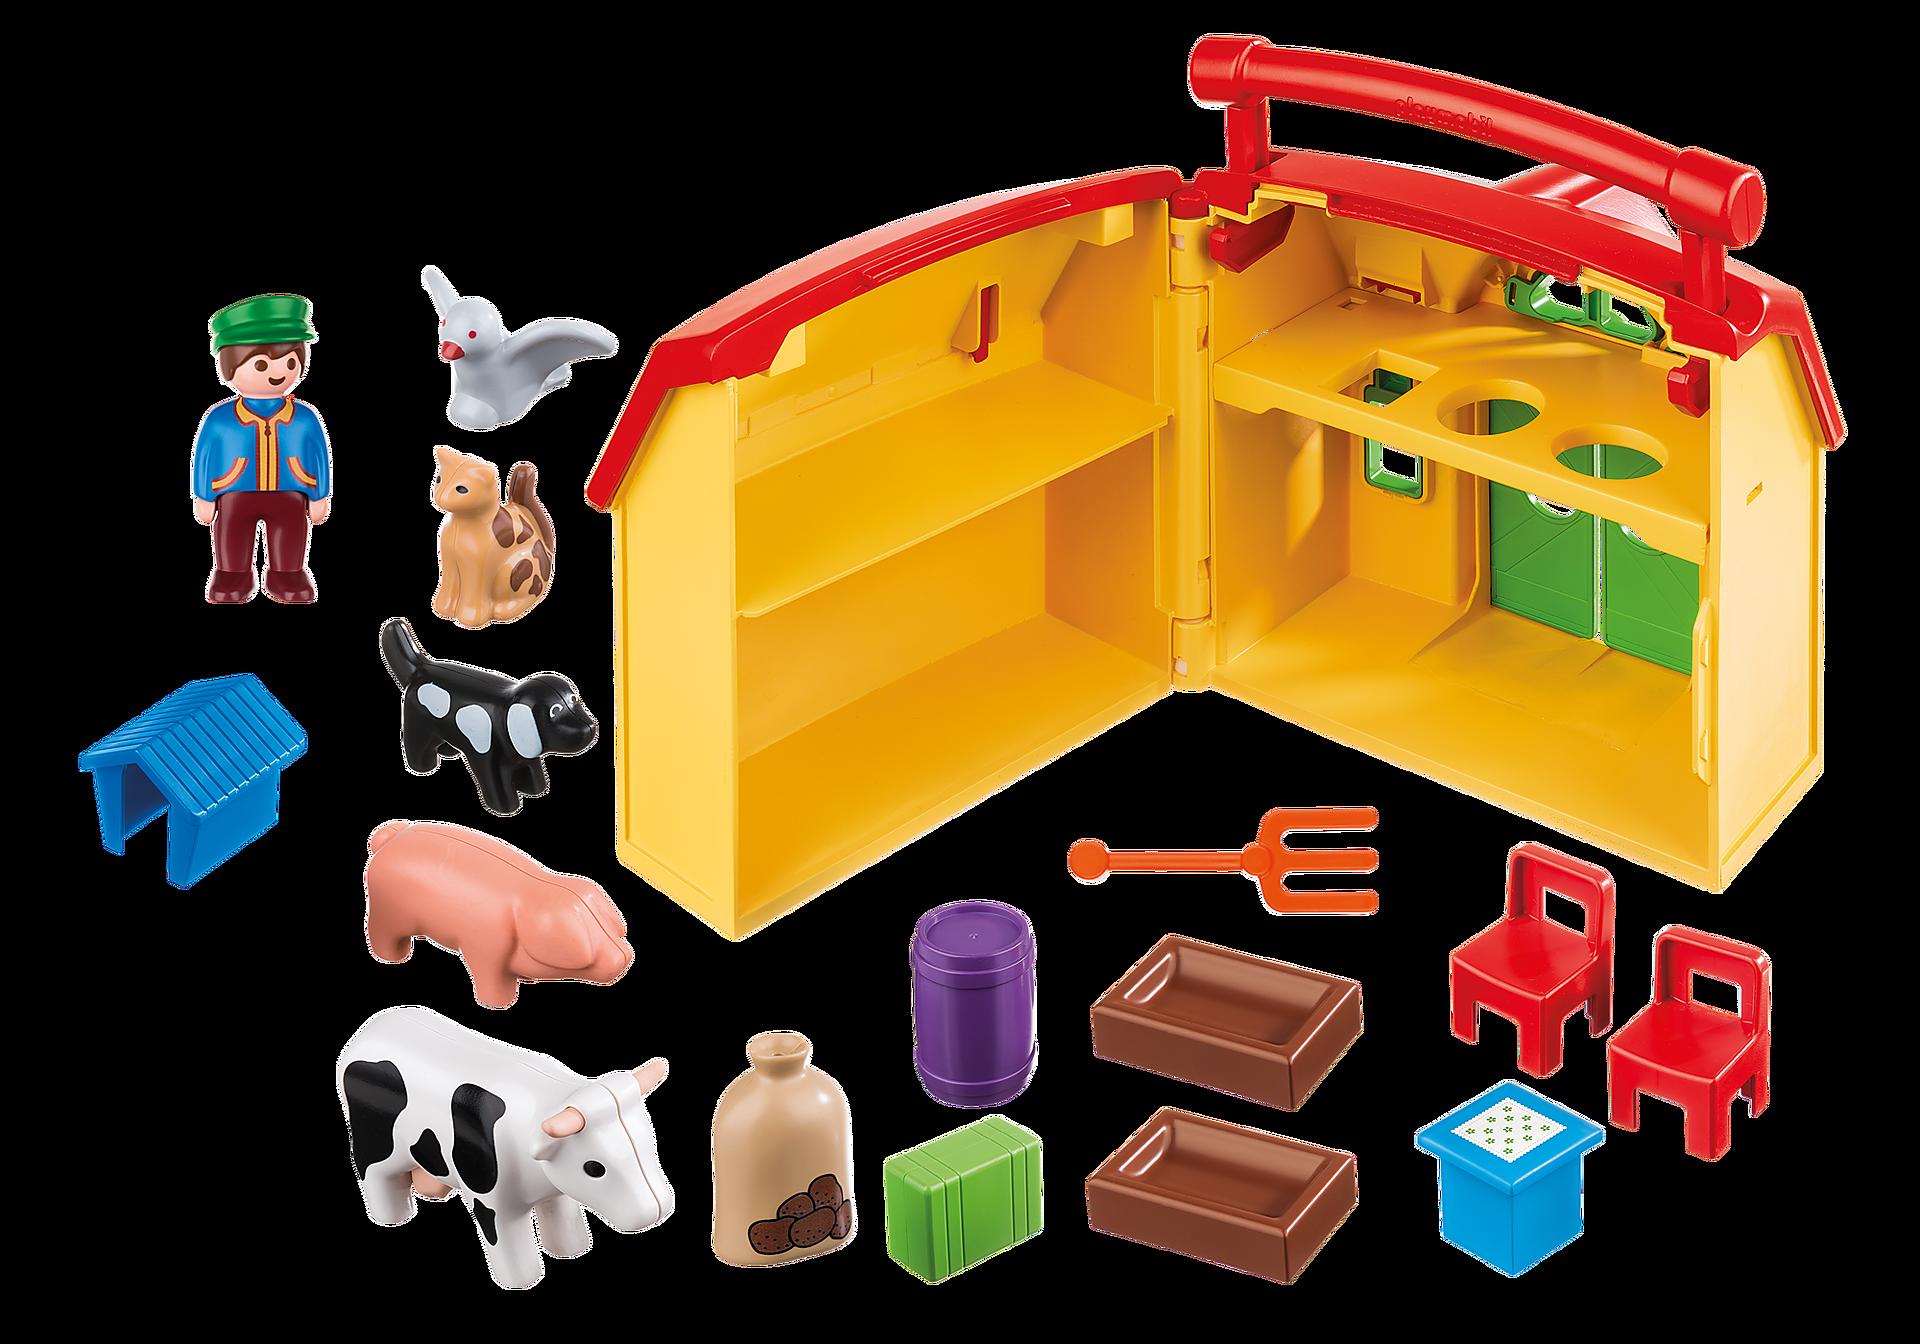 6962 Meeneemboerderij met dieren zoom image4